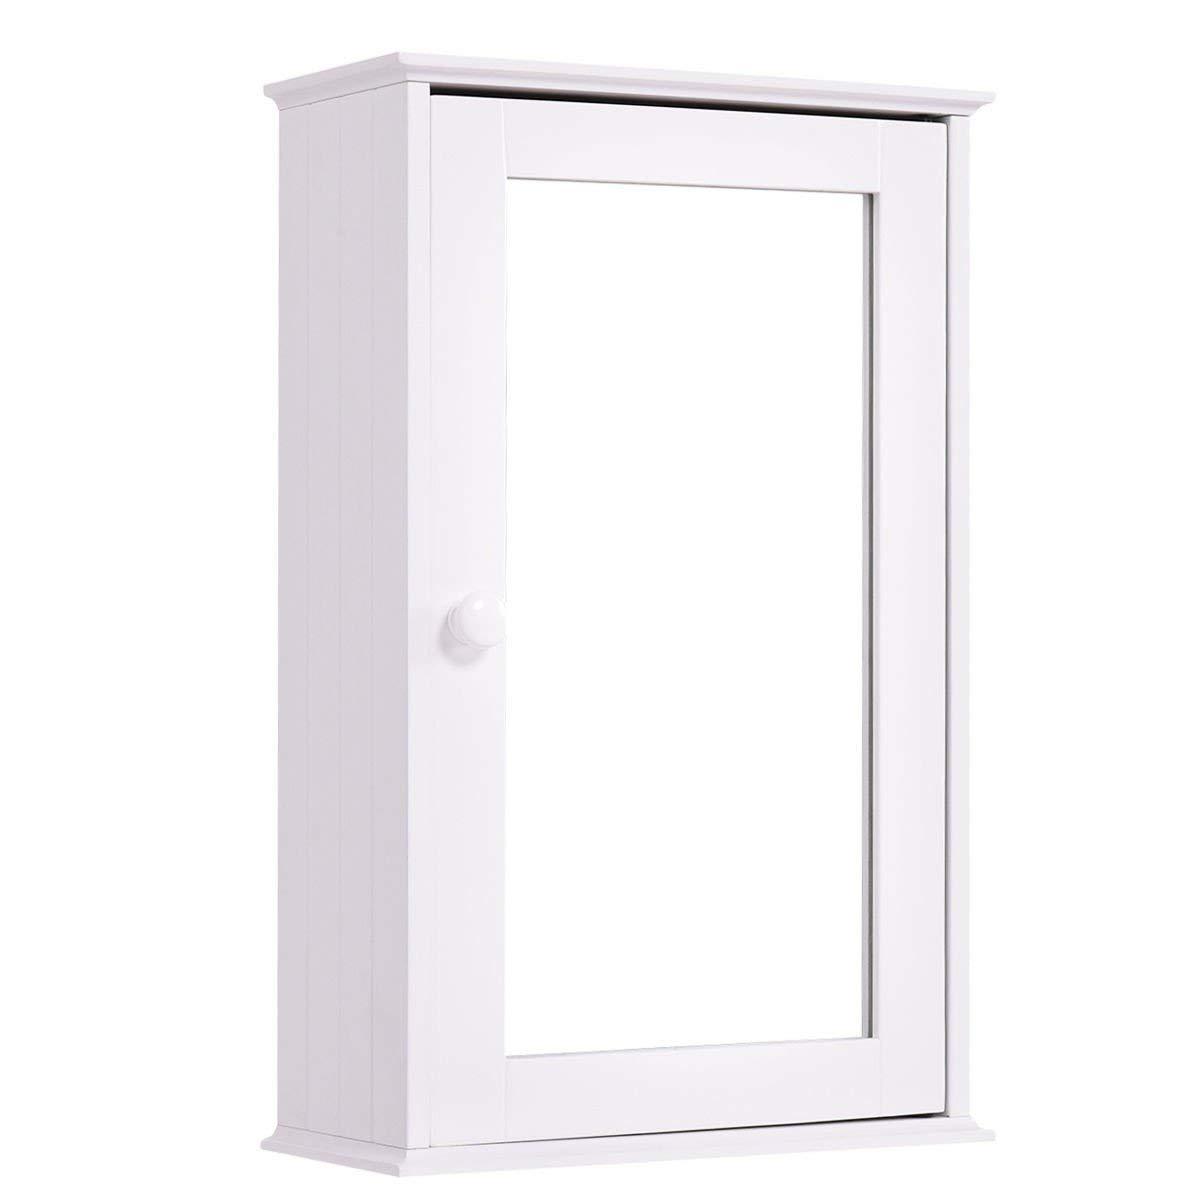 Cheap 3 Door Bathroom Mirror Cabinets Find 3 Door Bathroom Mirror